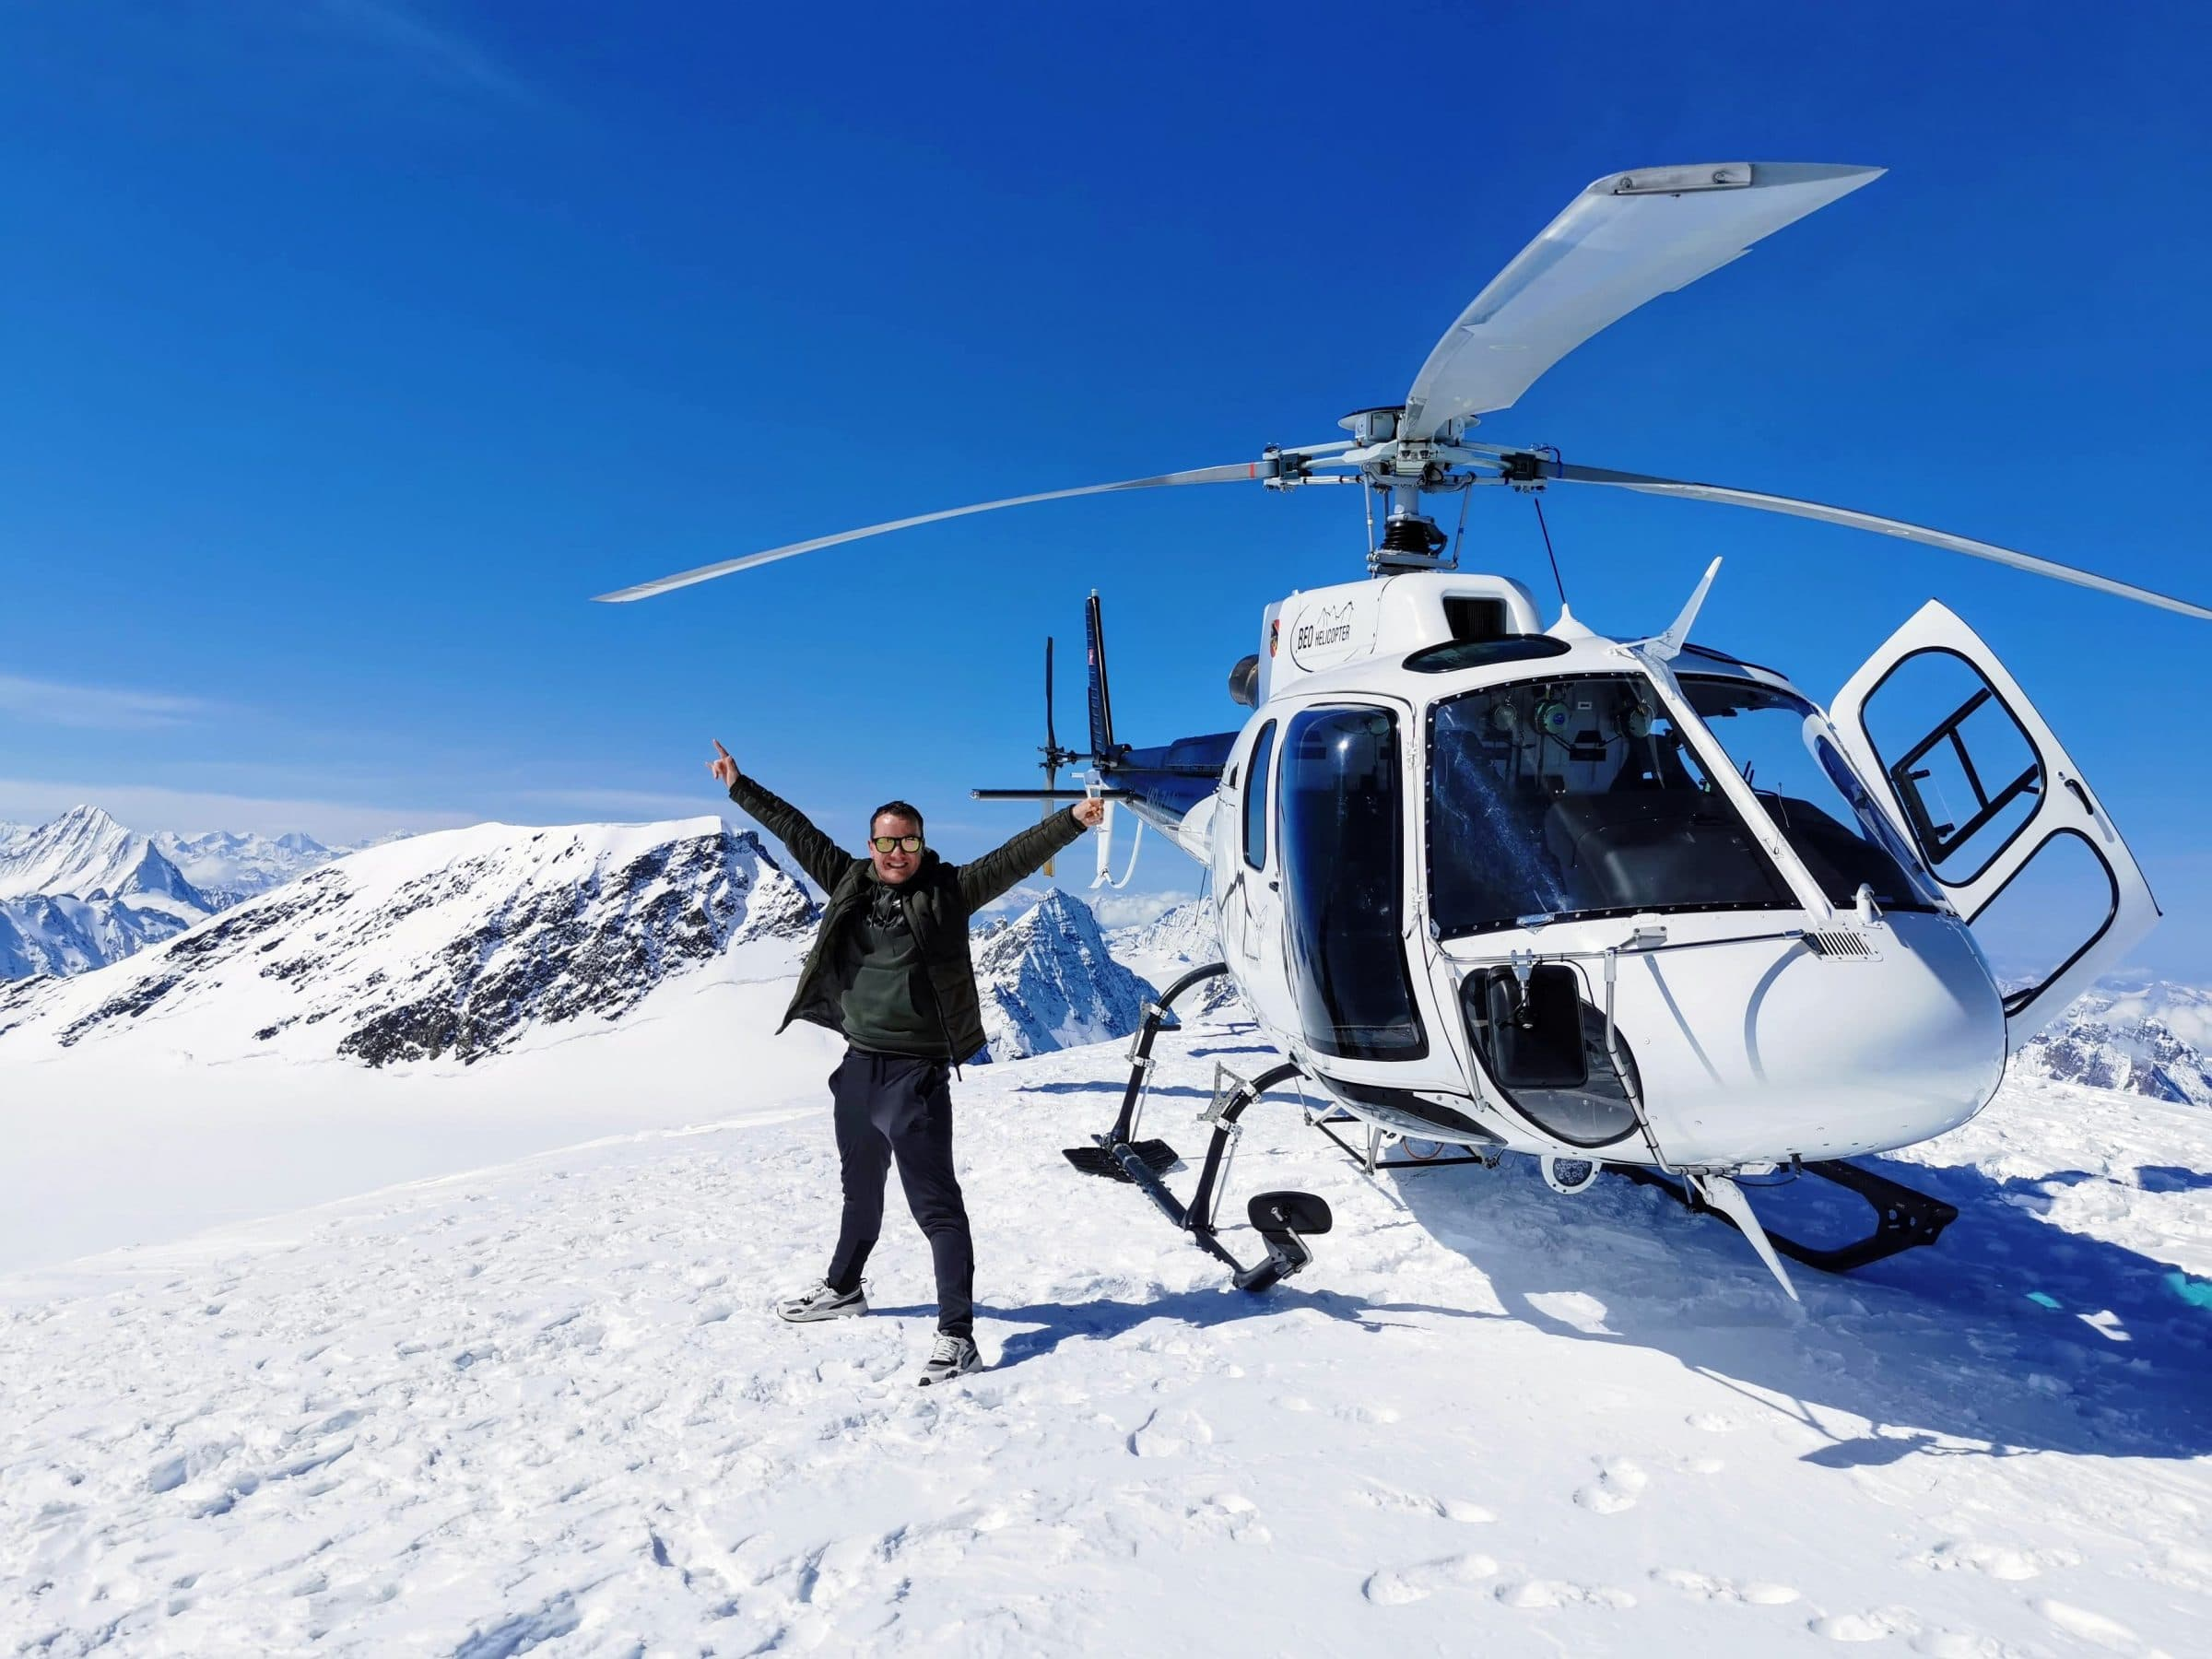 The happiest man on earth | We zijn geland op de Eiger Gletsjer